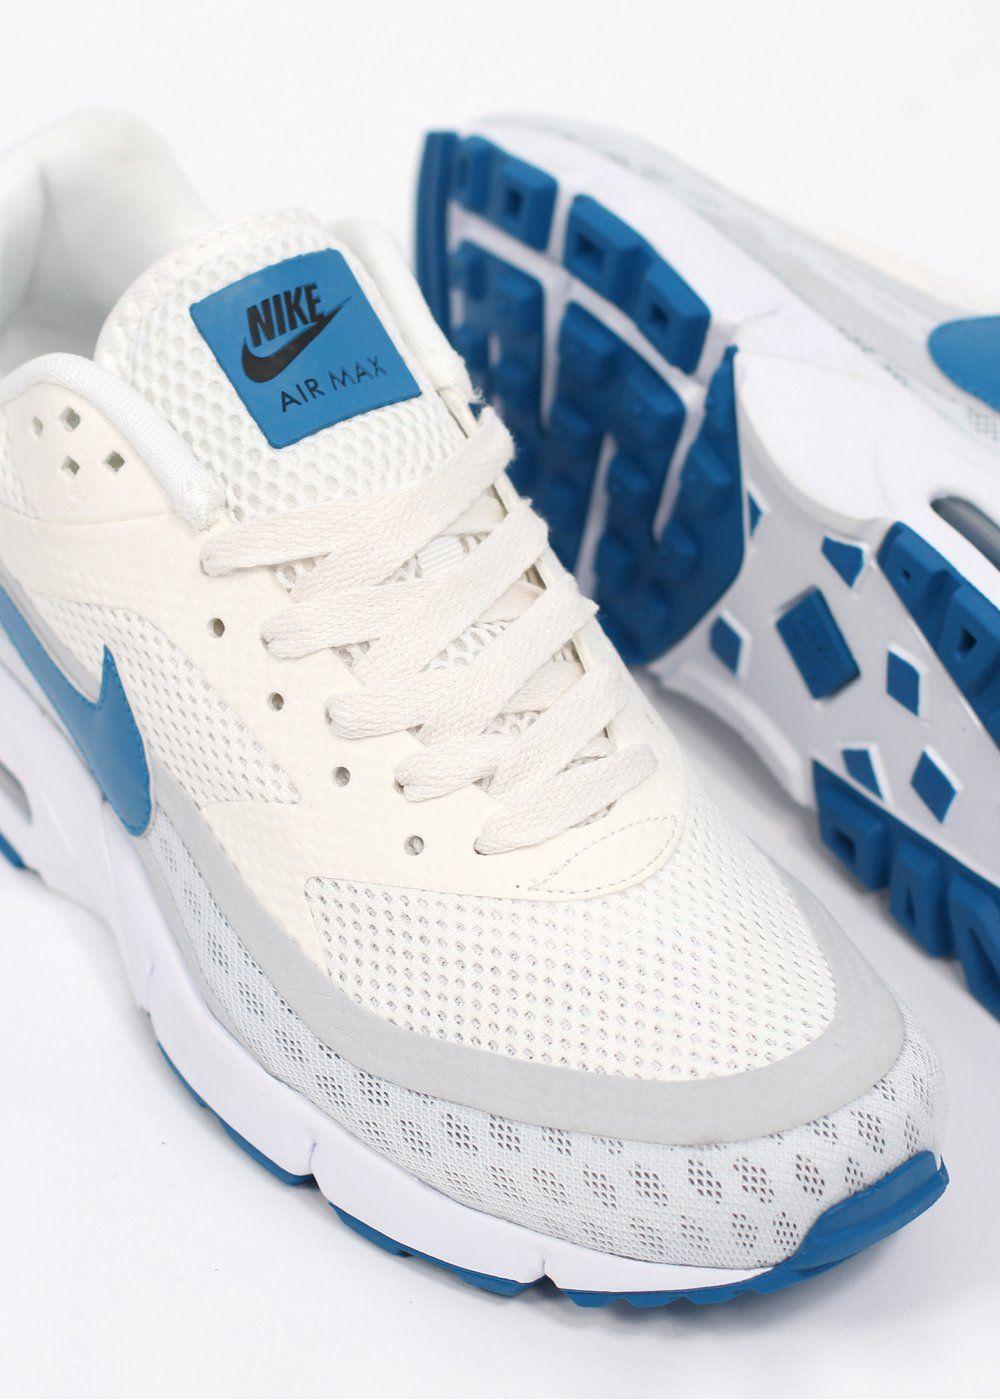 Nike Air Classic BW GEN II Trainers - Summit White / Military Blue / Cool Grey